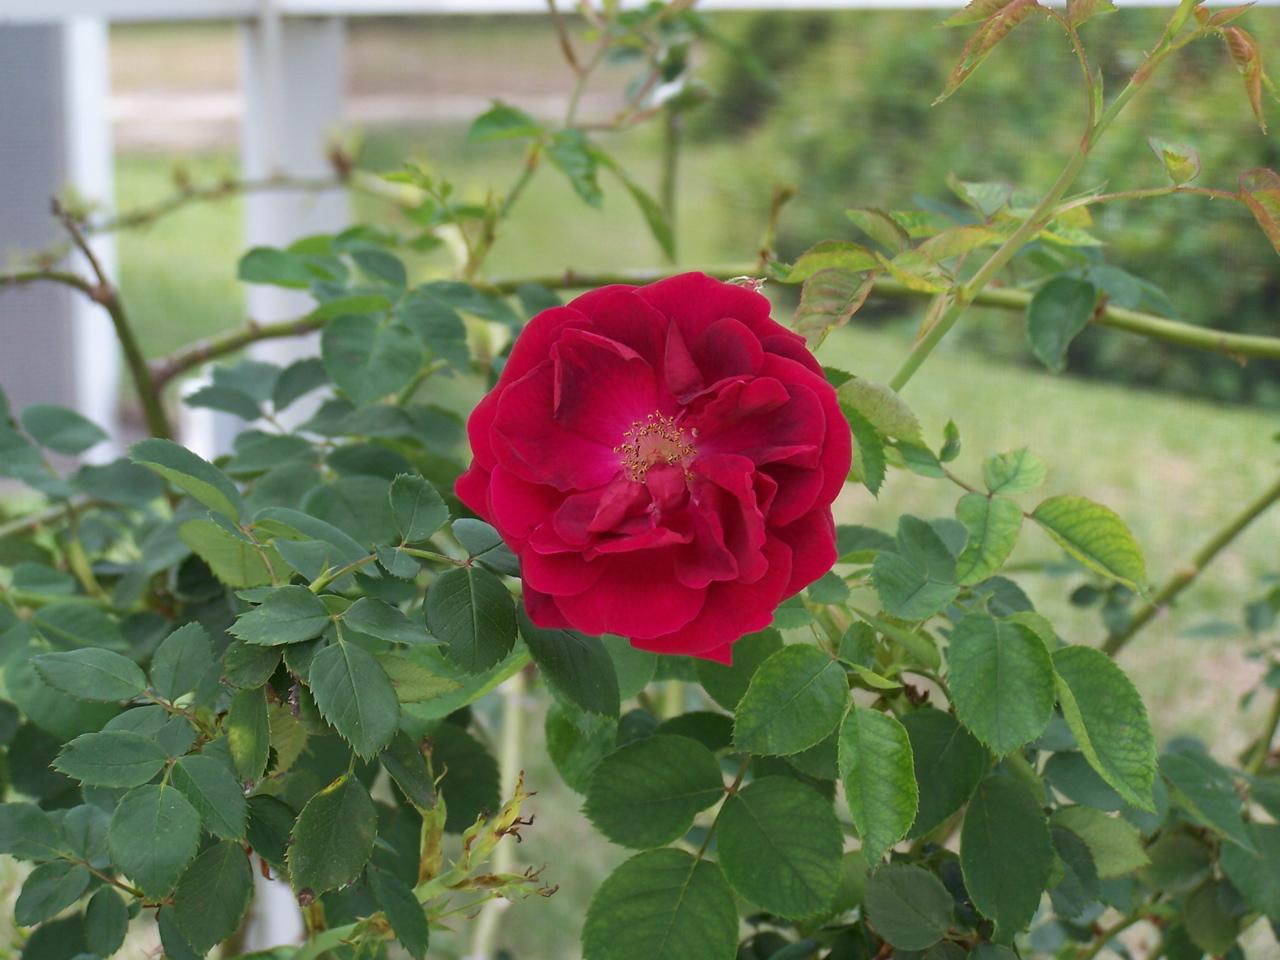 [Christine+G-+rose.jpg]